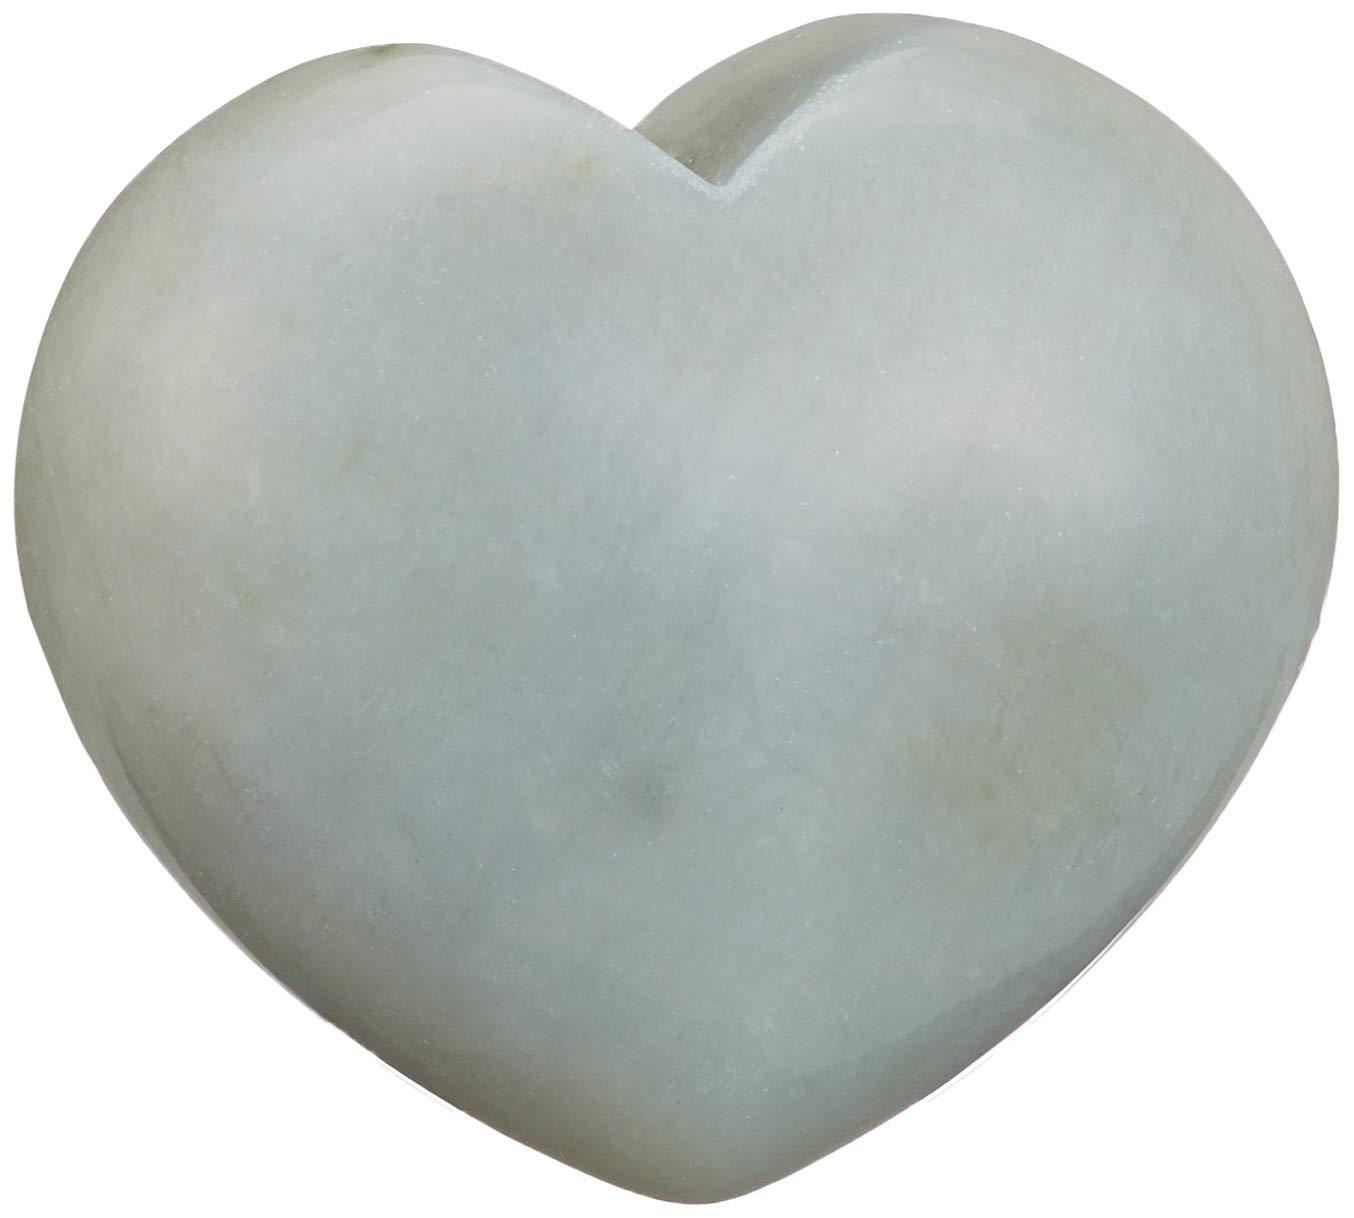 Stone Green Steengoed Heart Chinese Jade 40 mm 3.5 x 4 x 1 cm